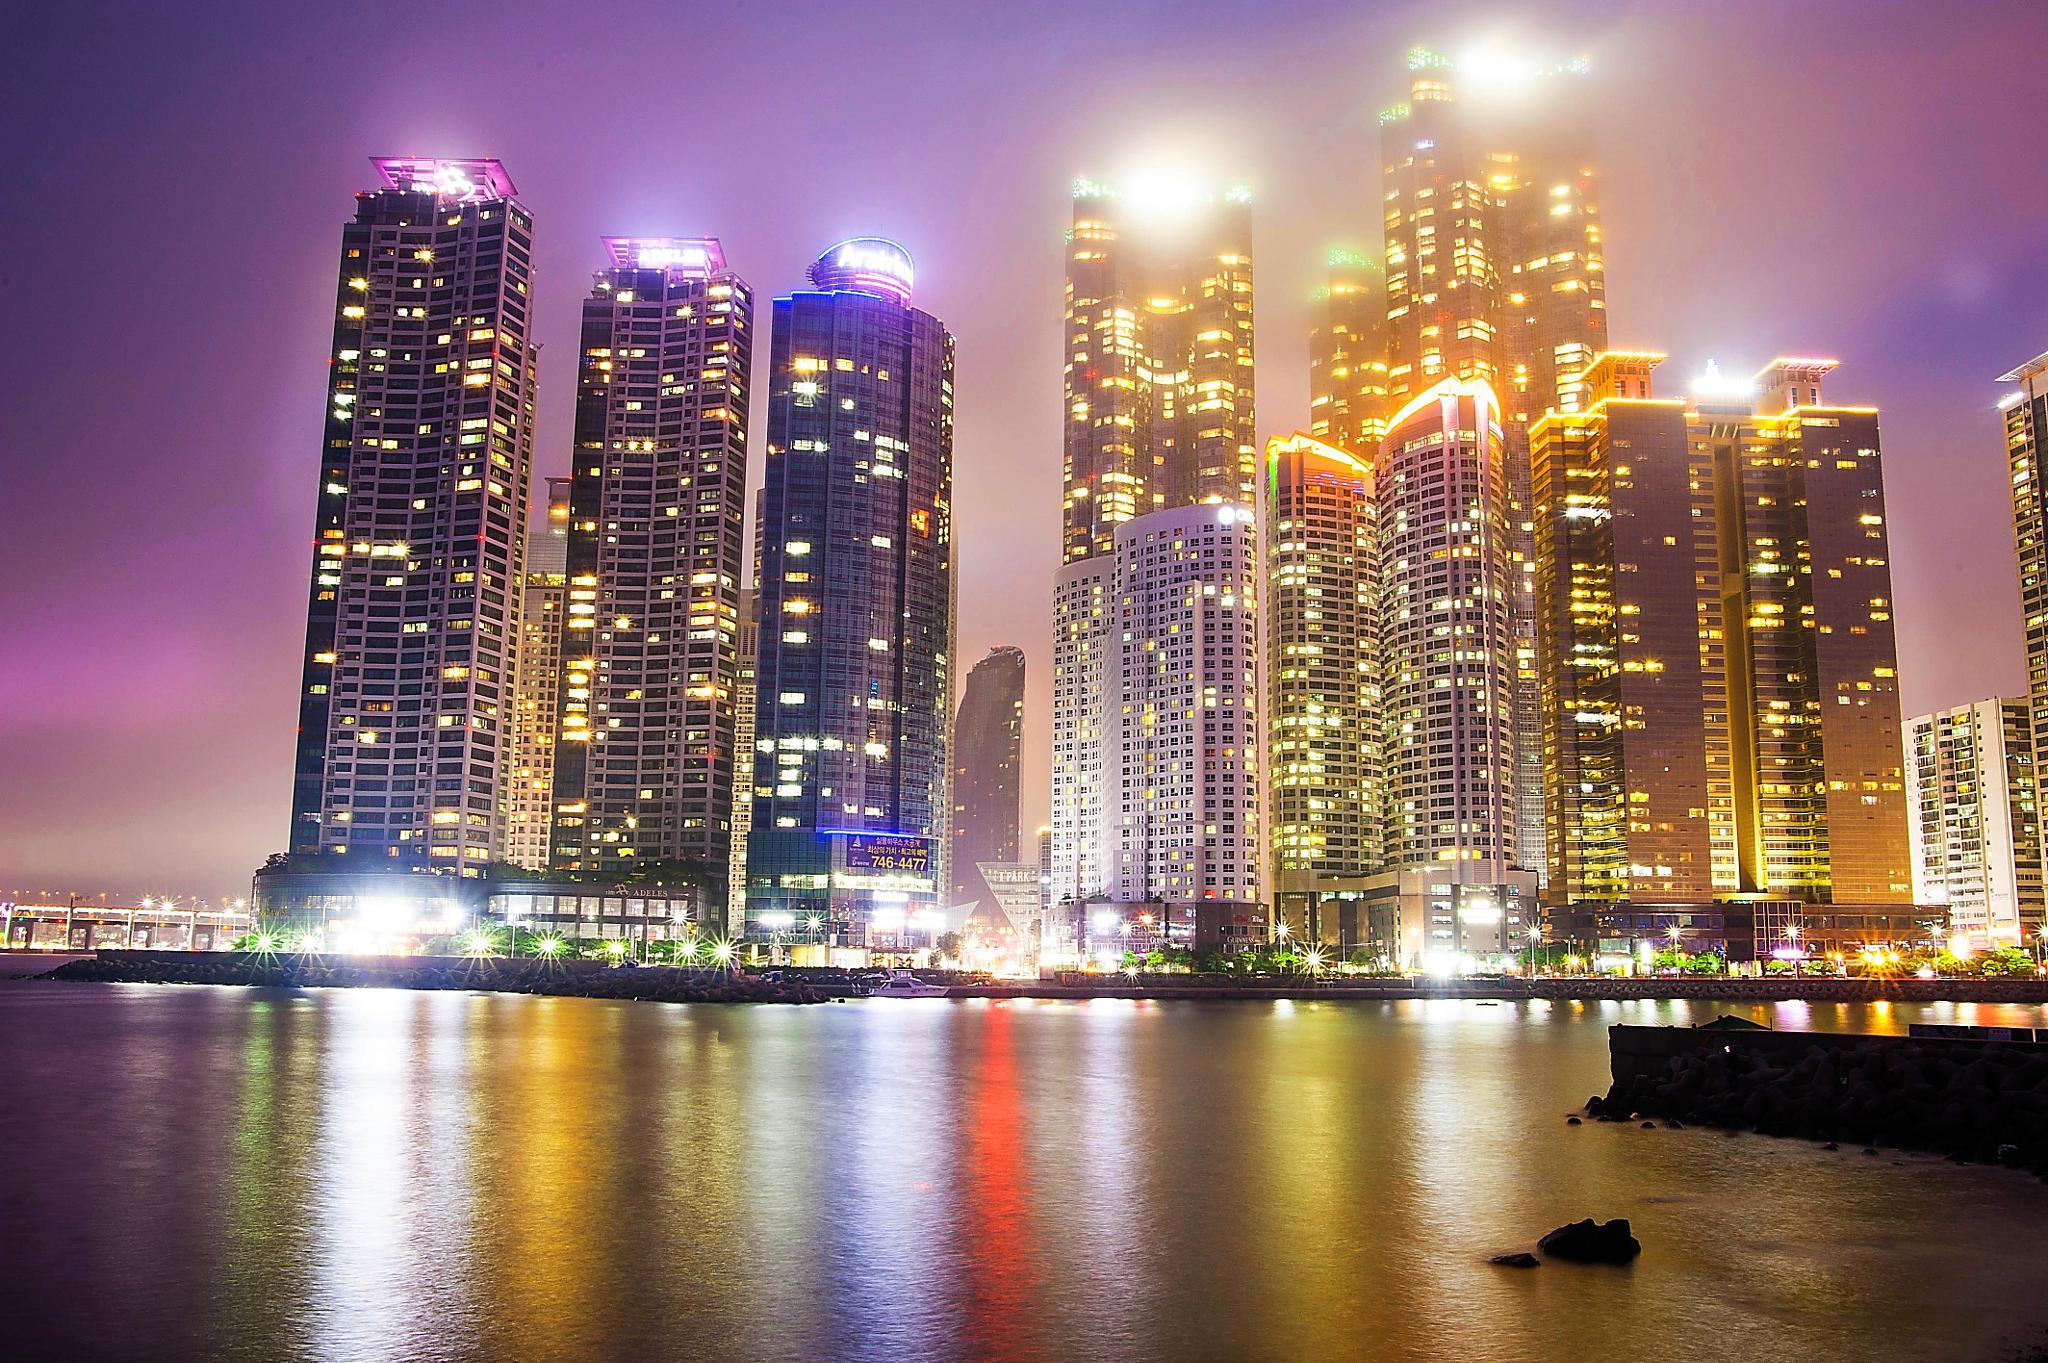 Busan Marine City by Bluesrock